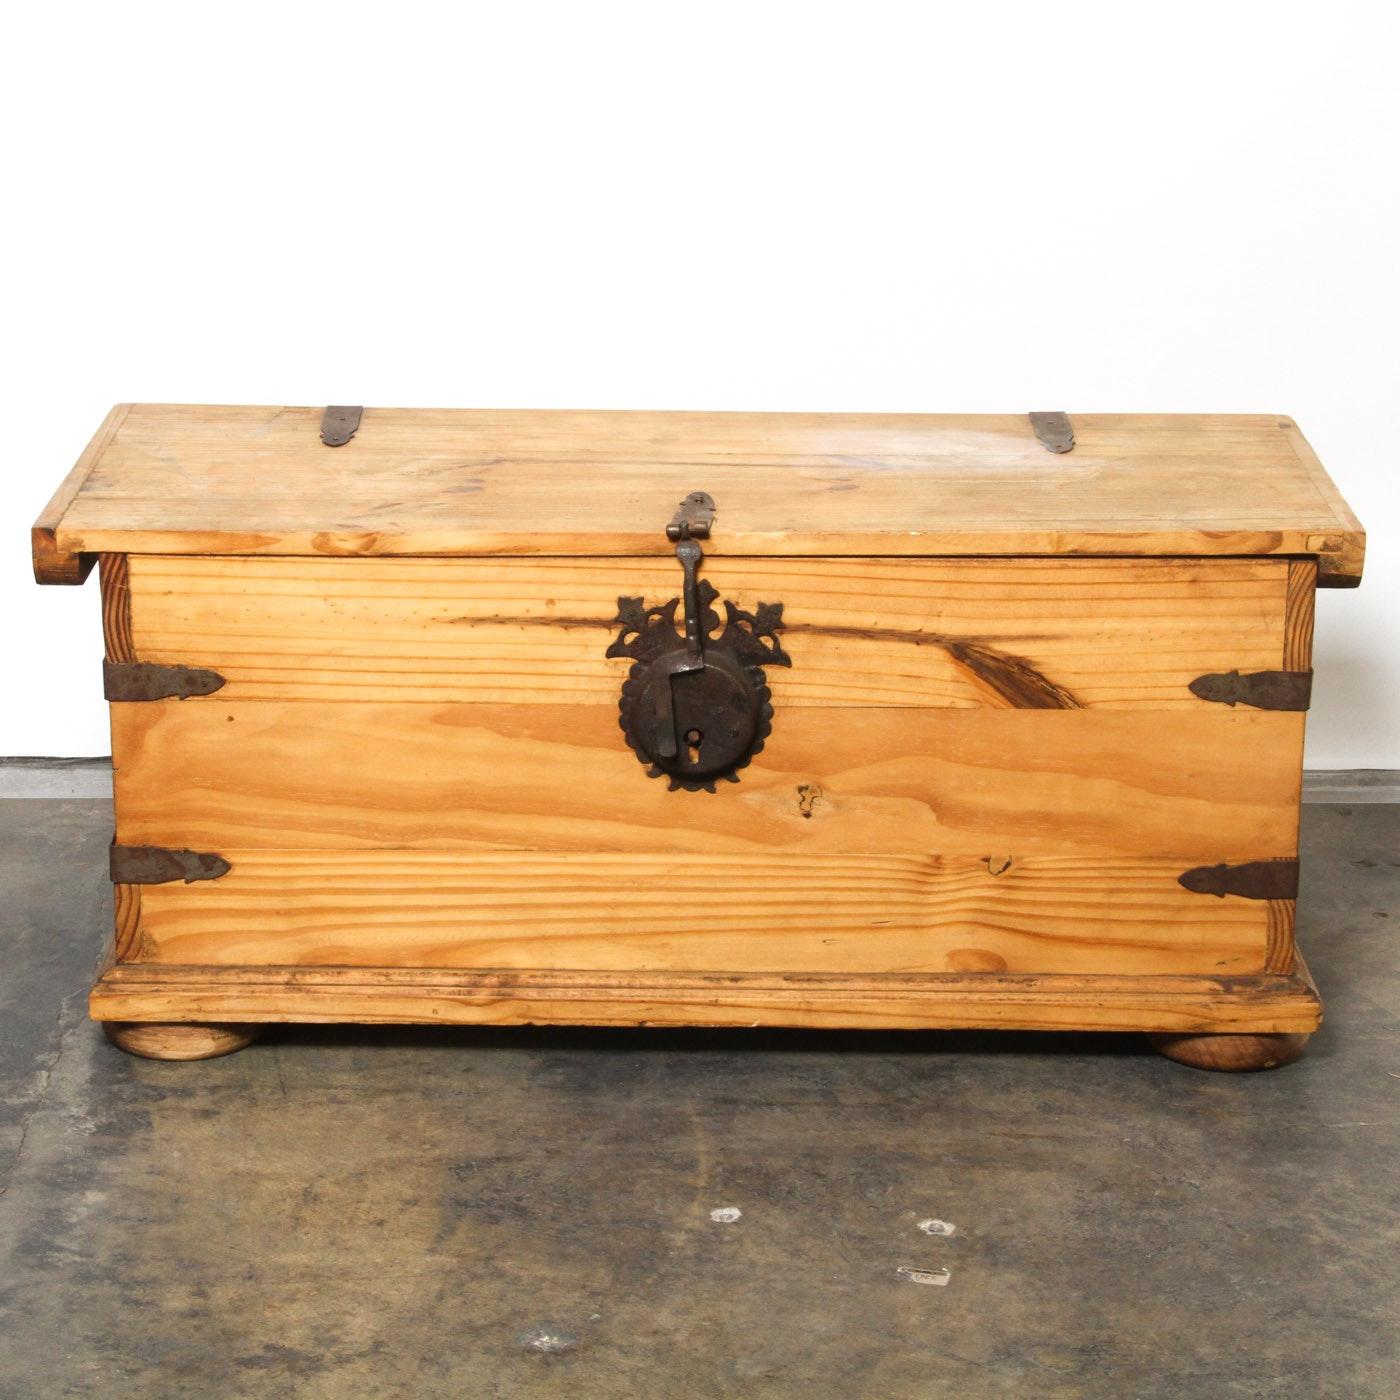 Vintage Wooden Chest with Brass Hardware